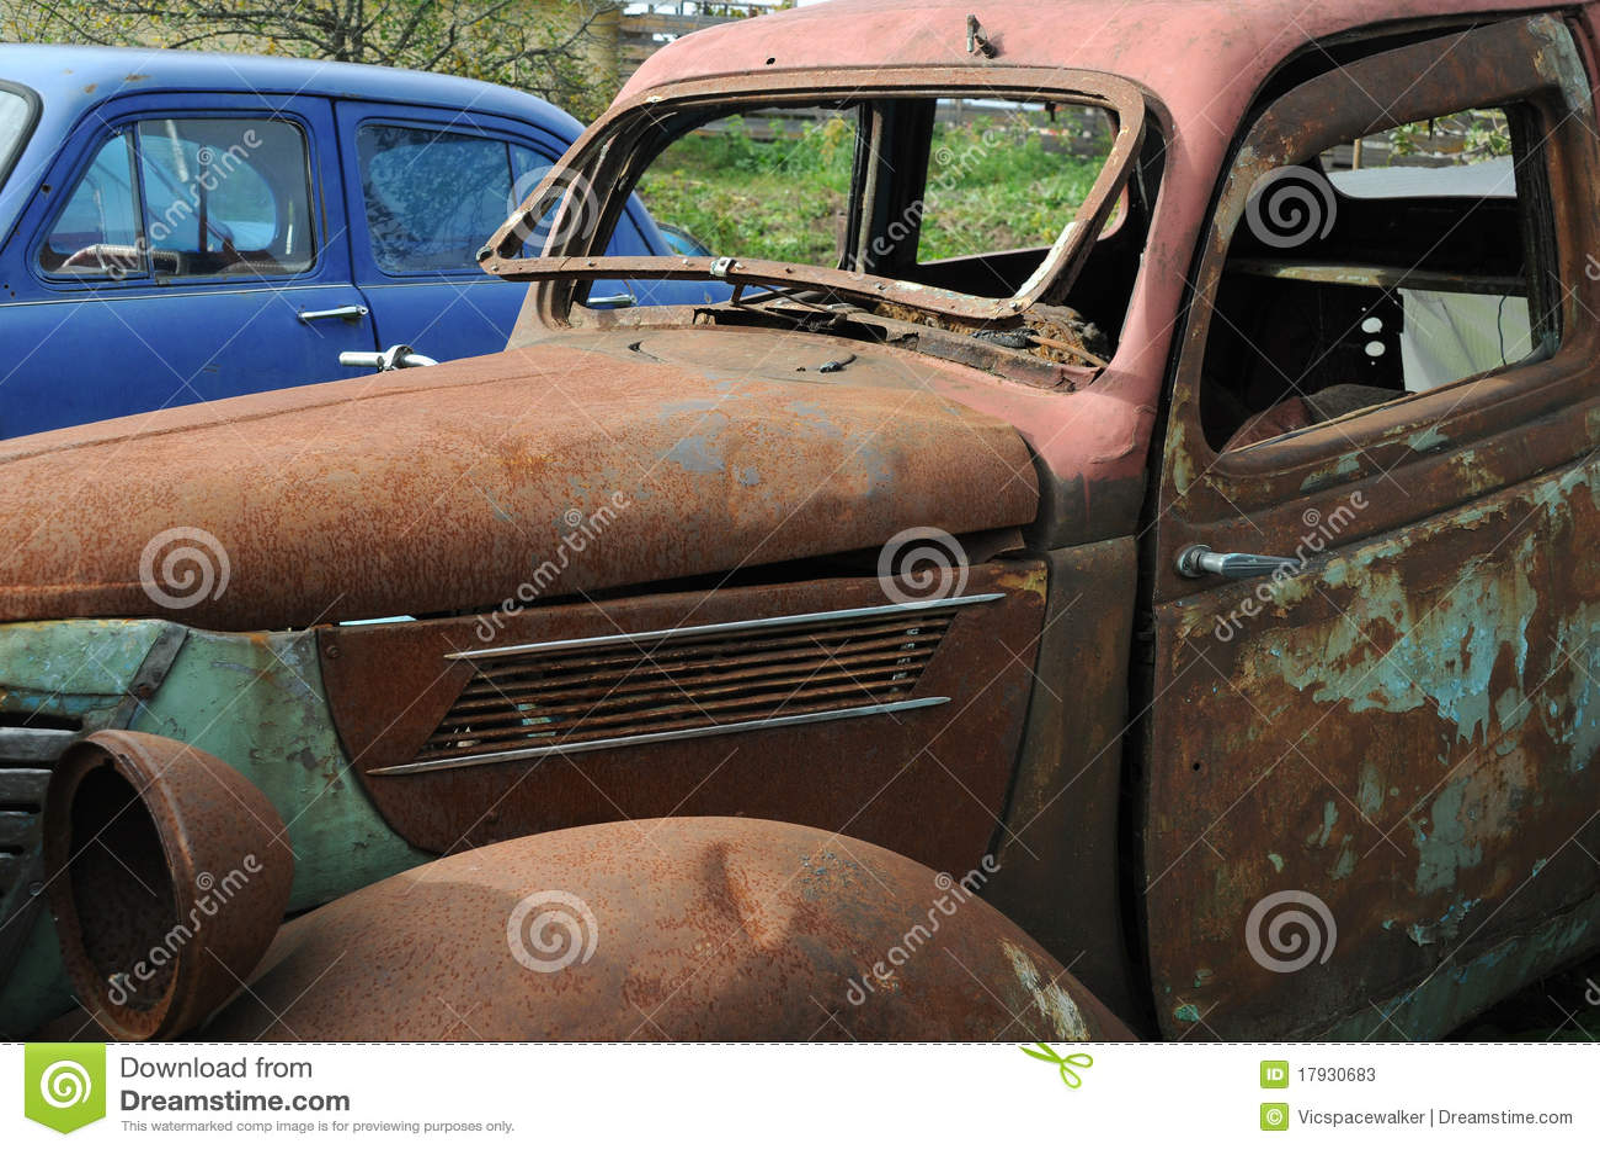 Old Cars in the Junkyard